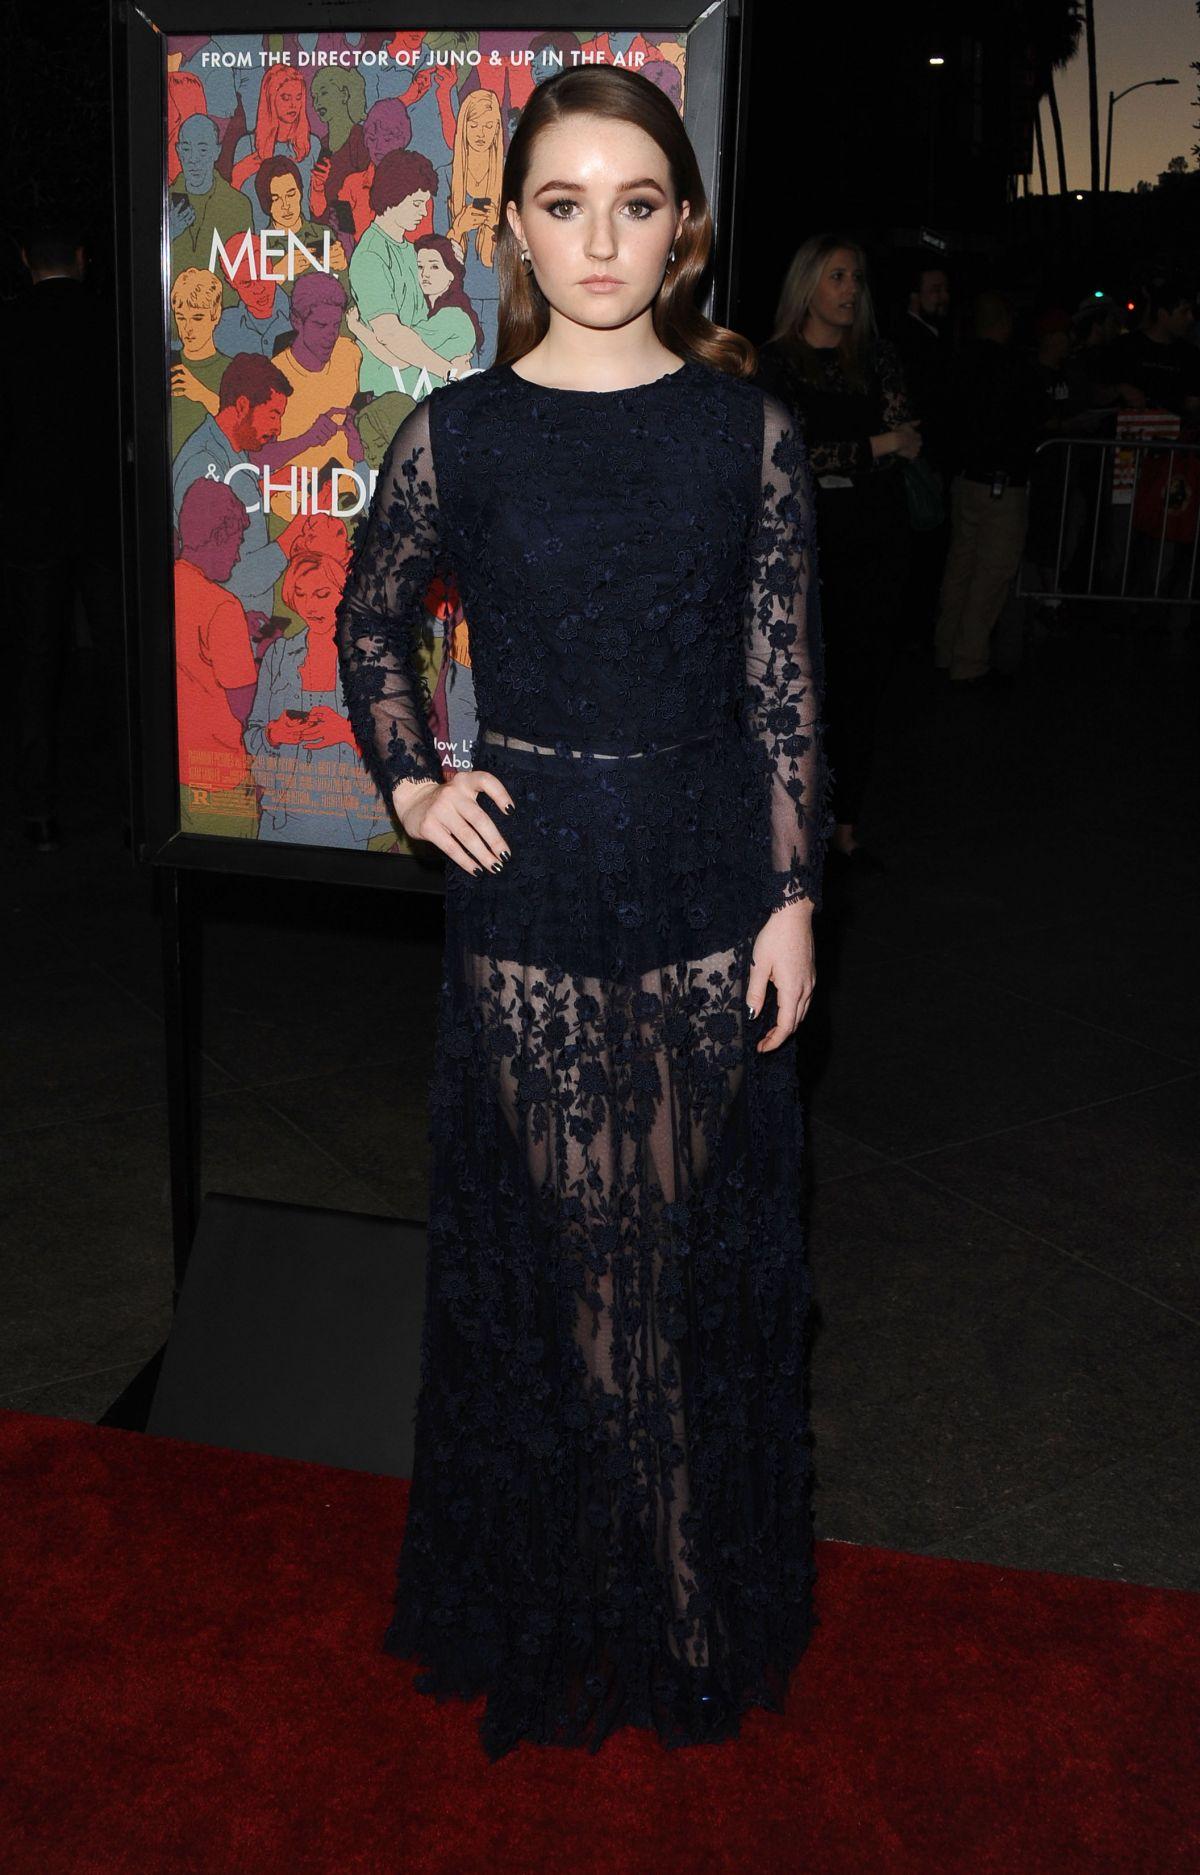 KAITLYN DEVER At Men Women And Children Premiere In Los Angeles HawtCelebs